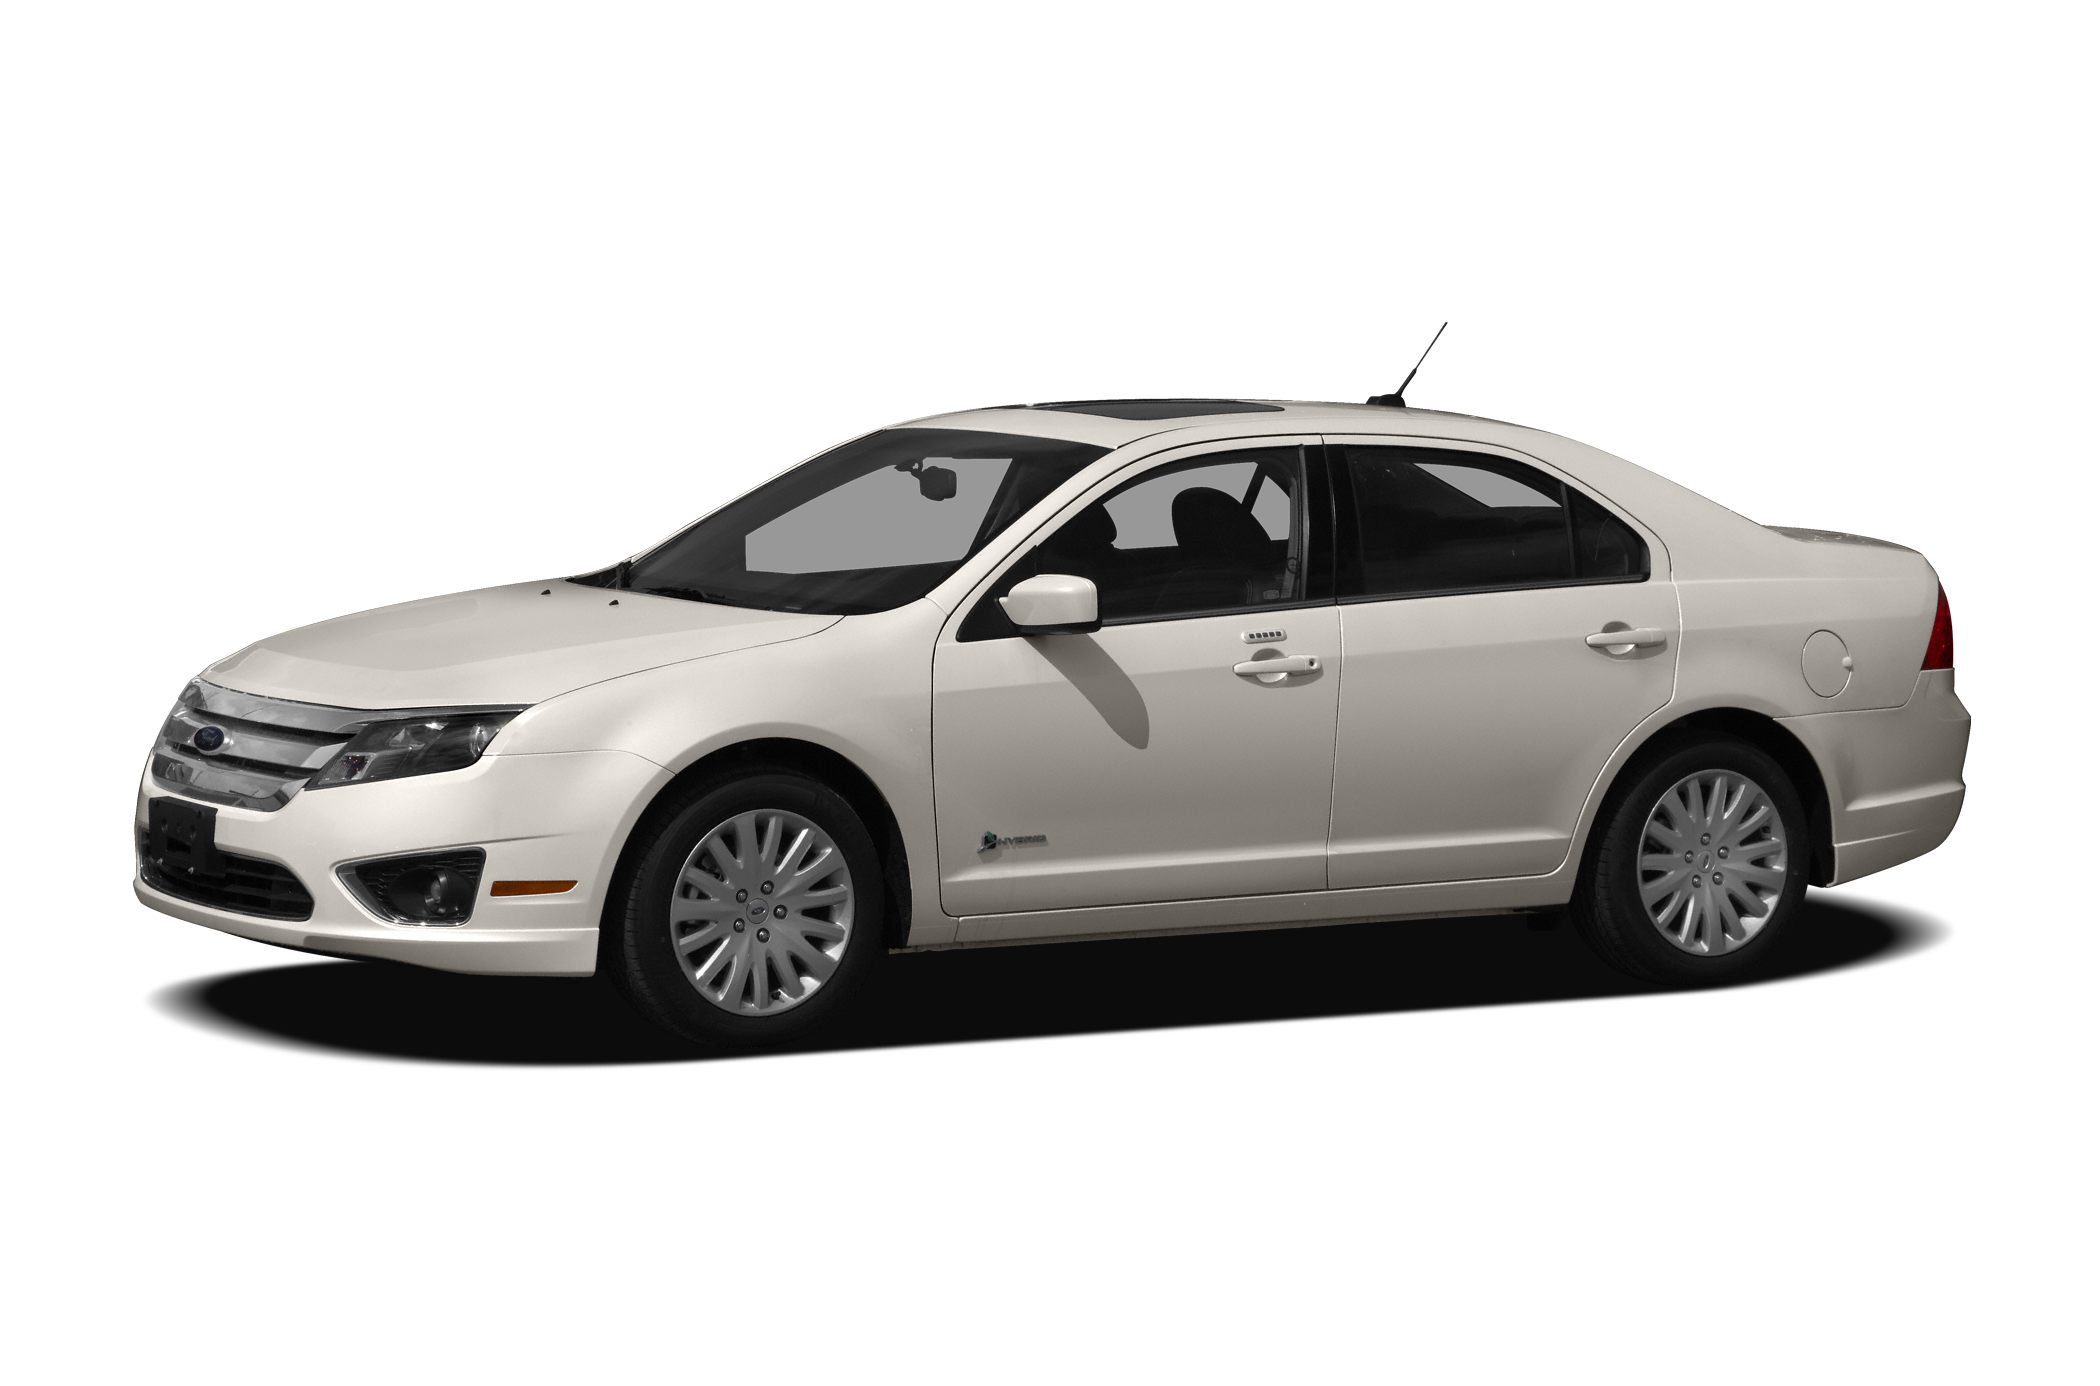 2011 Ford Fusion Hybrid New Car Test Drive